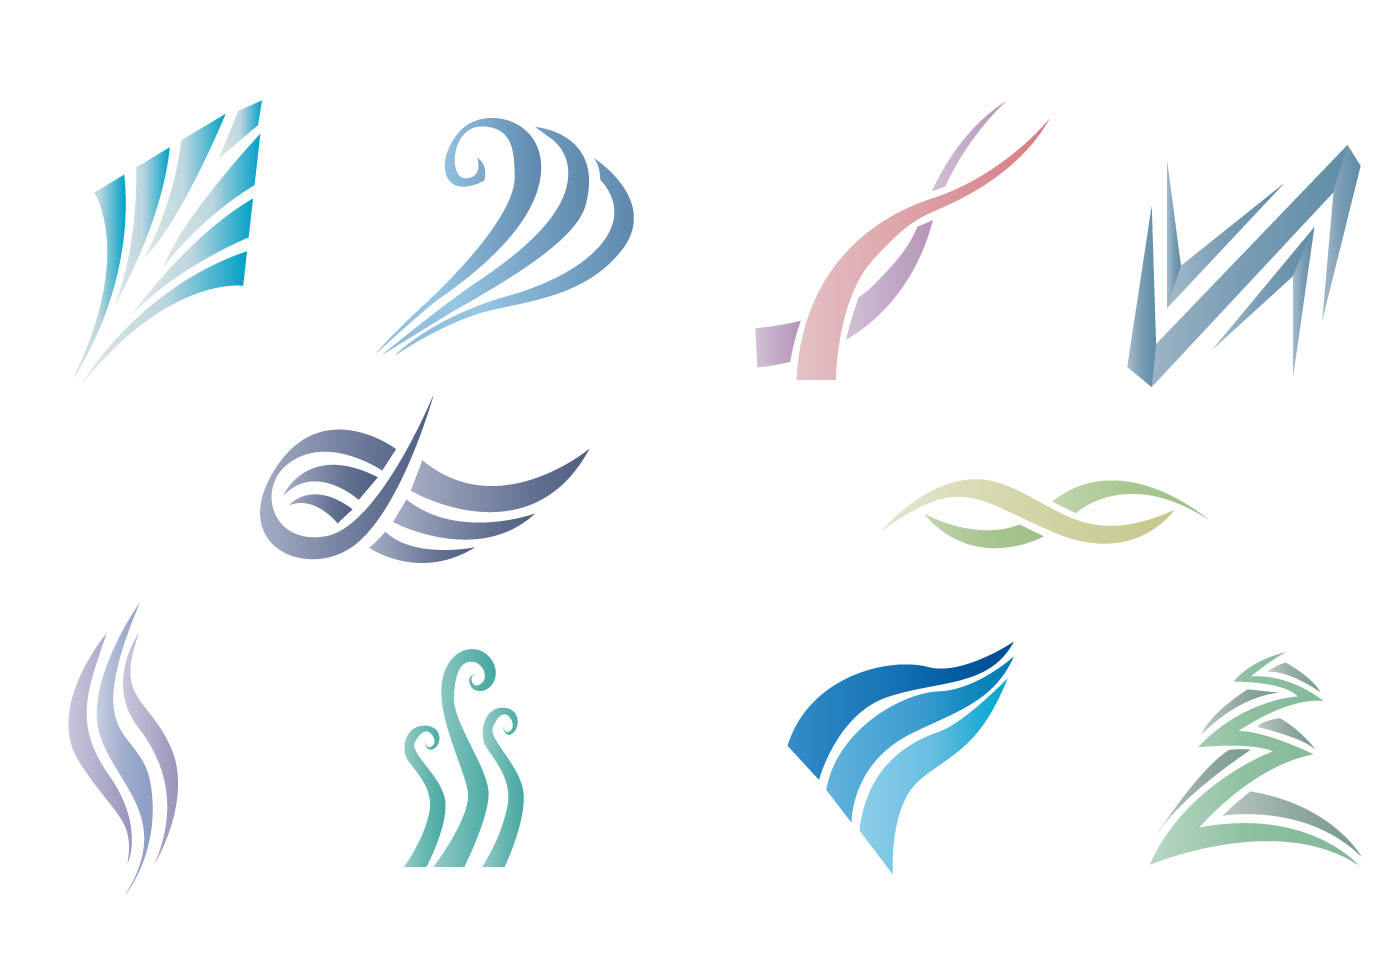 swish object abstract gradient color vector pack Swoosh Fonts Free Download Swoosh Vector Art